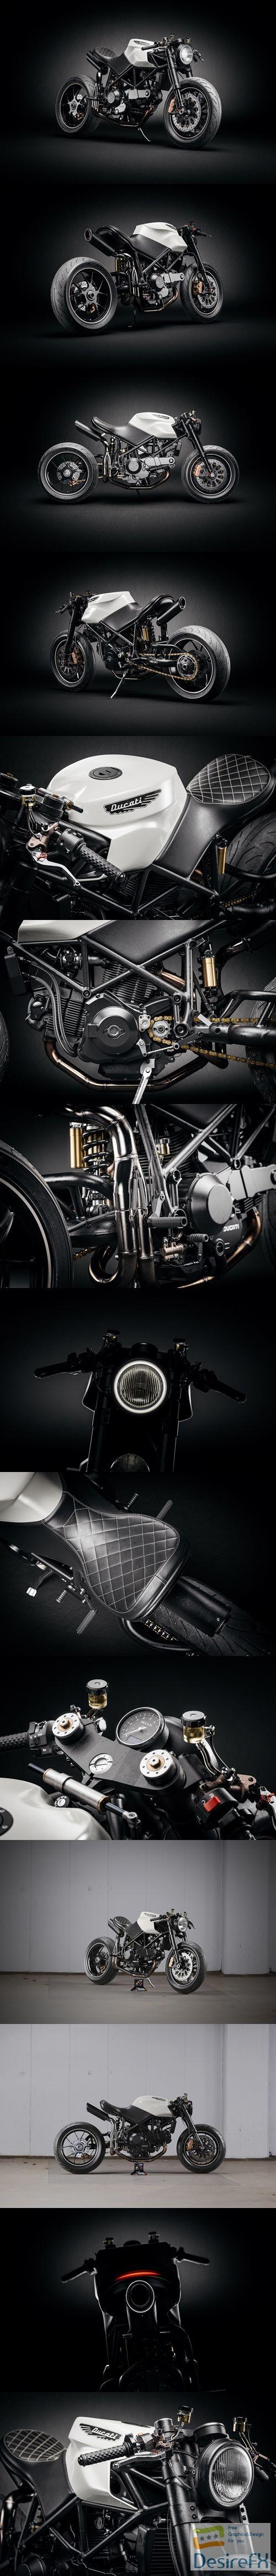 Ducati 916 Custom Cafe Fighter Bike 3D Model